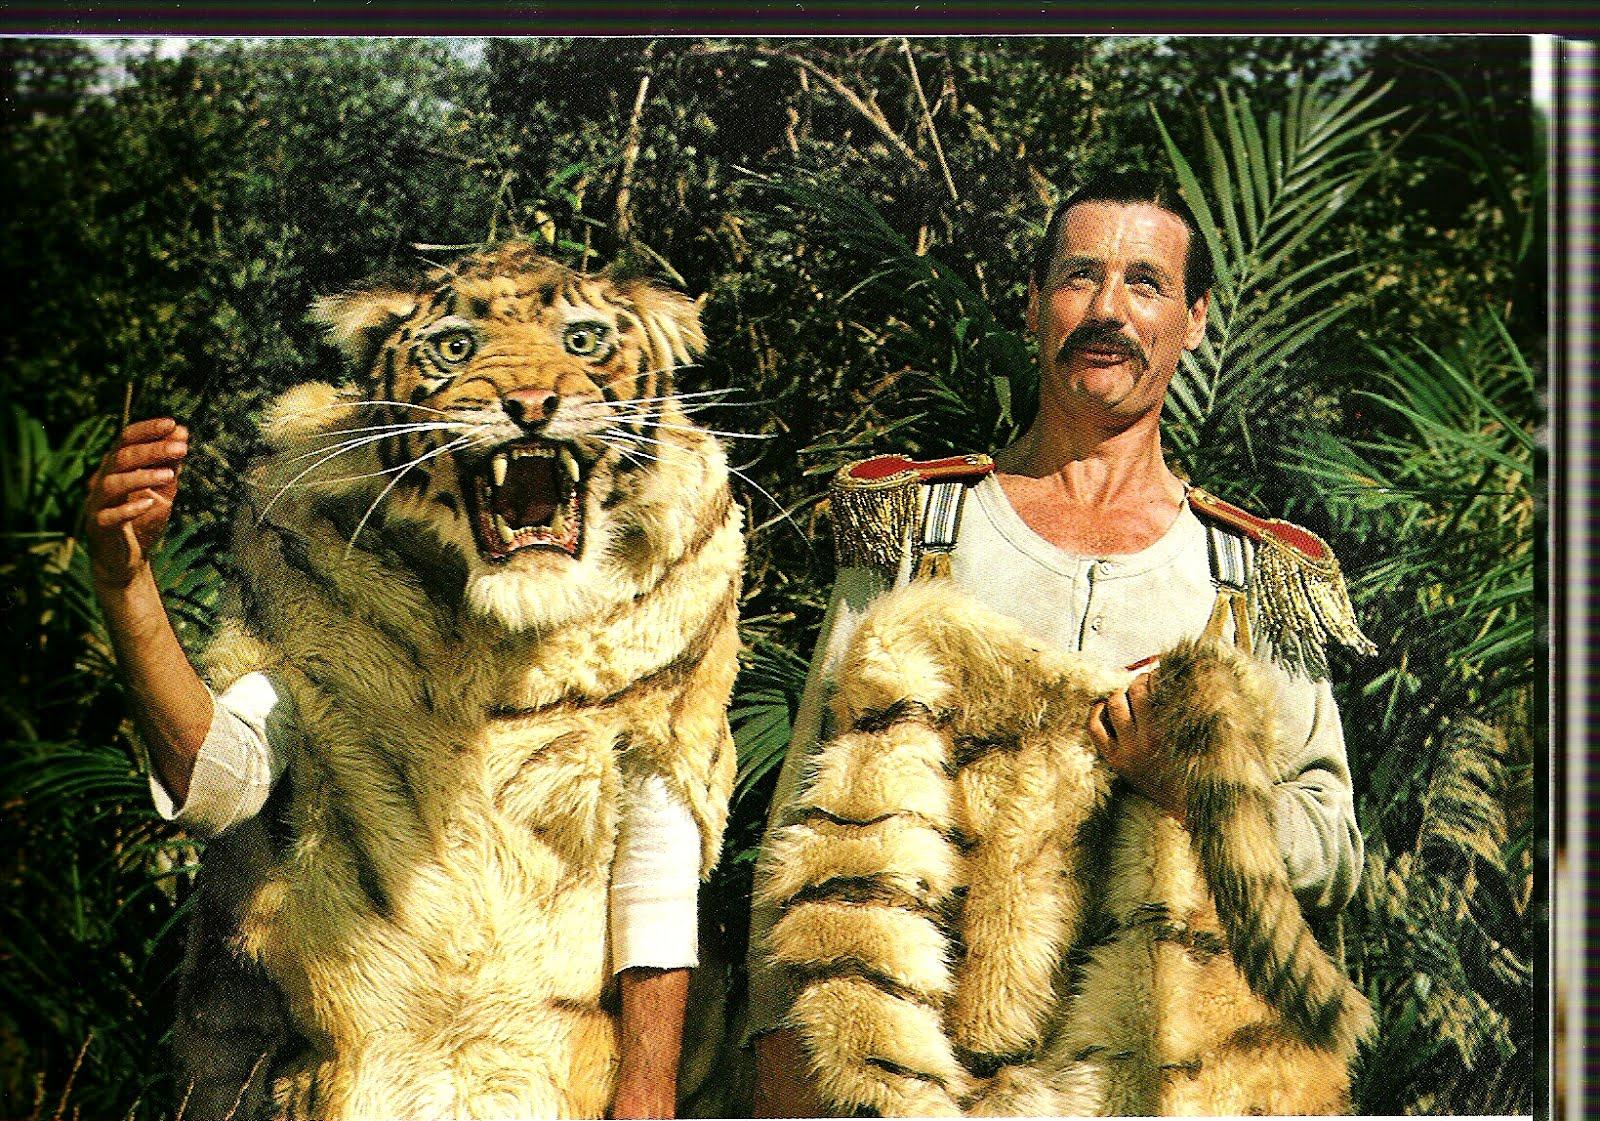 tigre-monty-python-andar-tolo